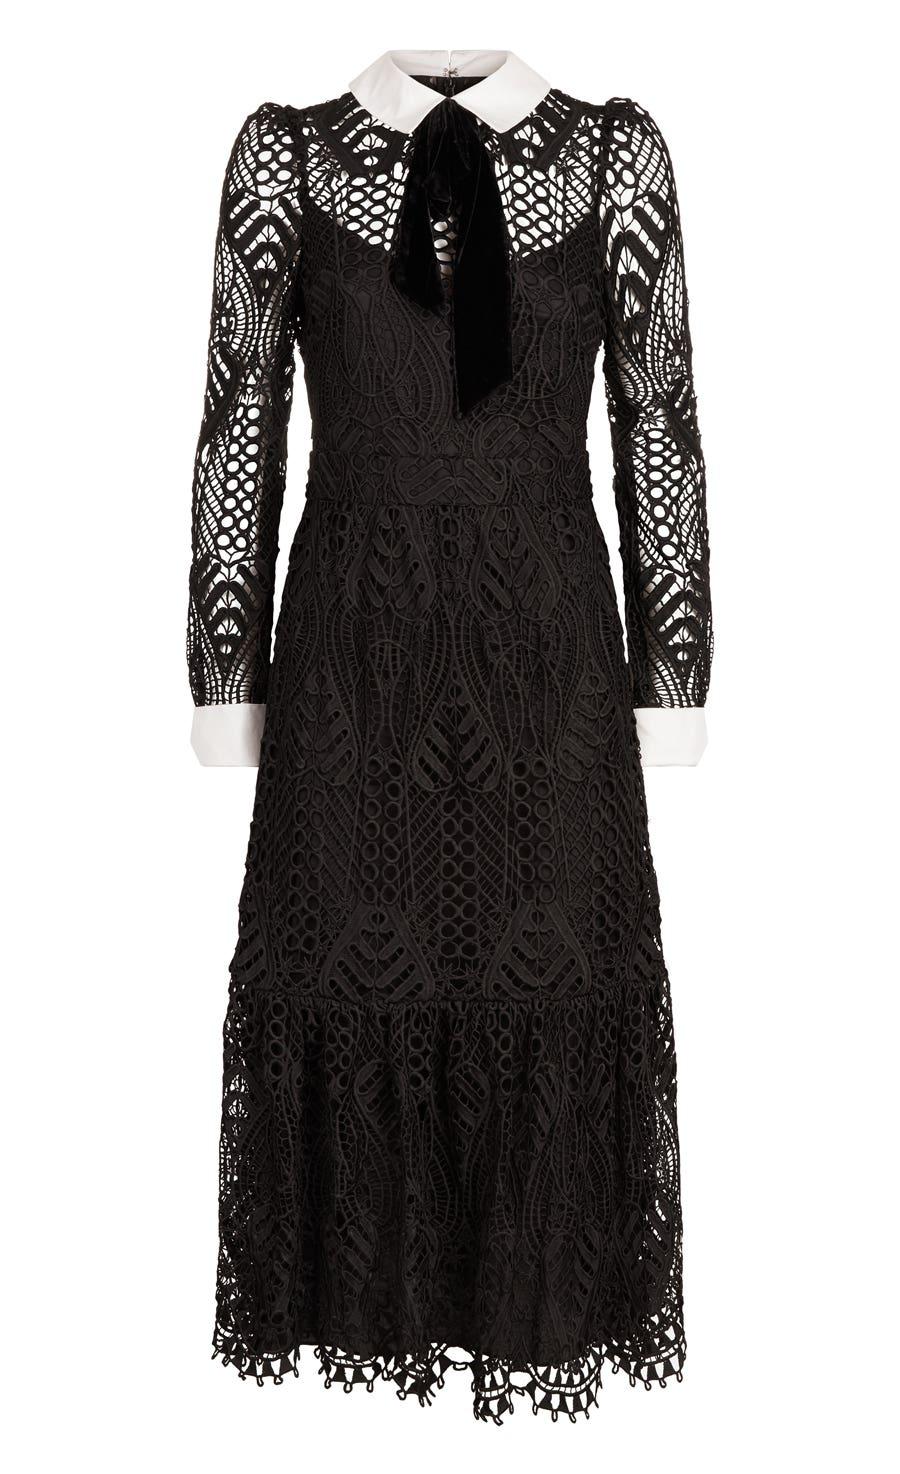 New Moon Dress, Black